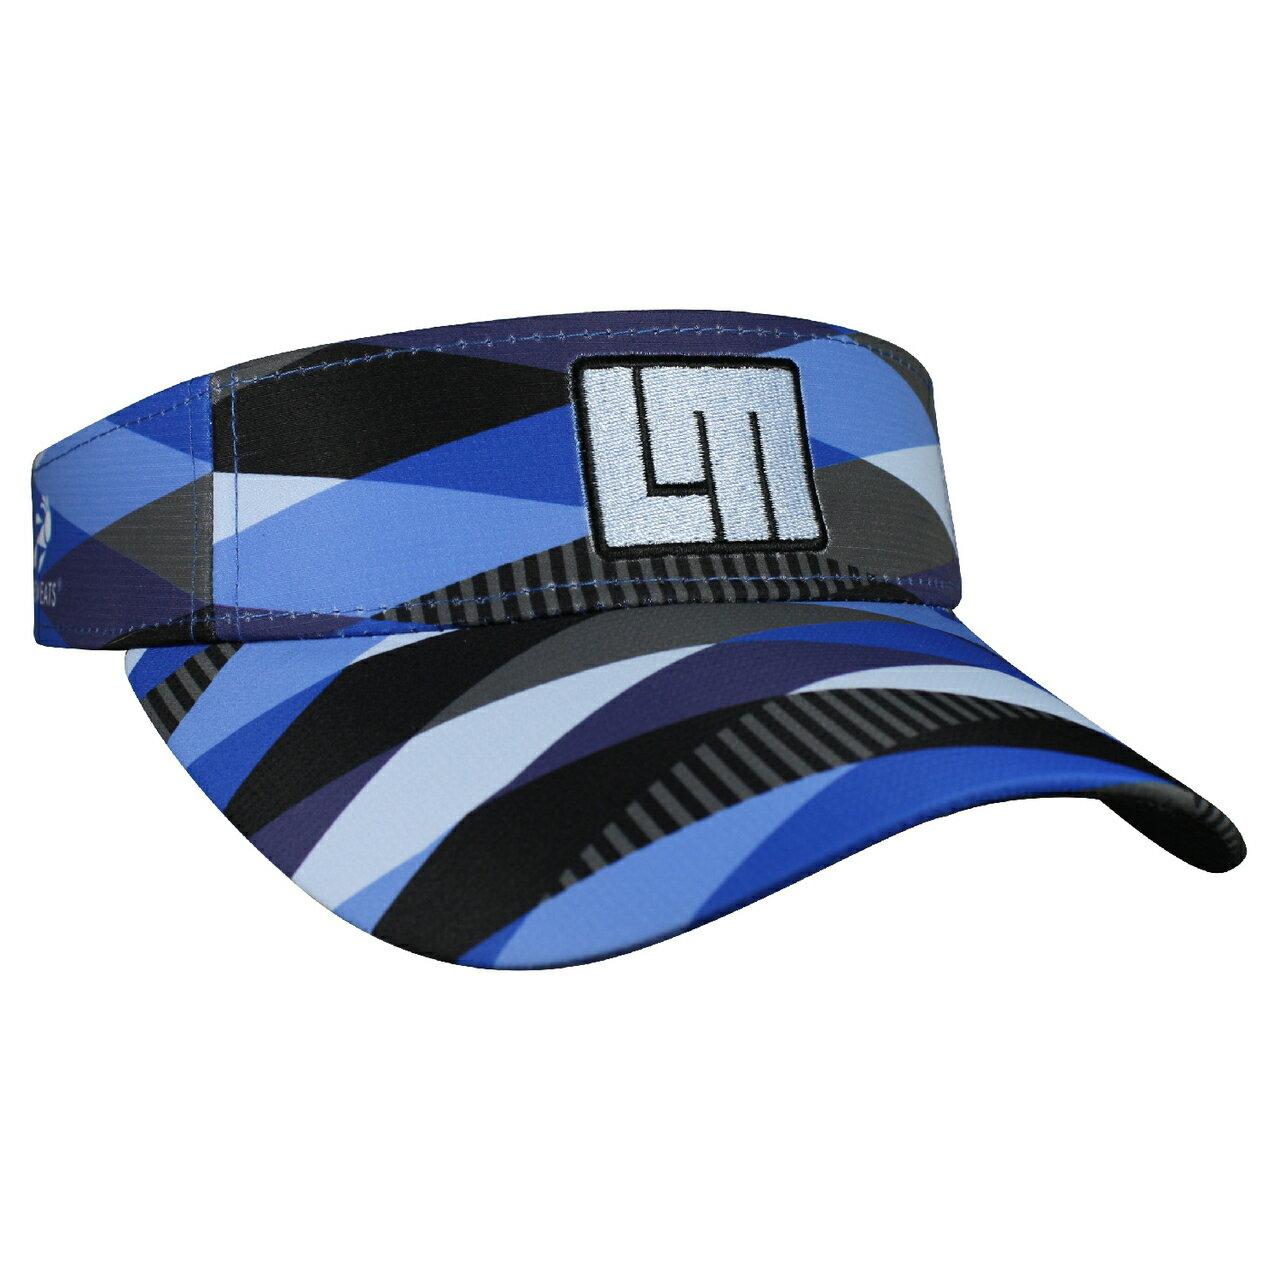 LOUDMOUTH 英國高爾夫服飾品牌-藍色明暗中空帽